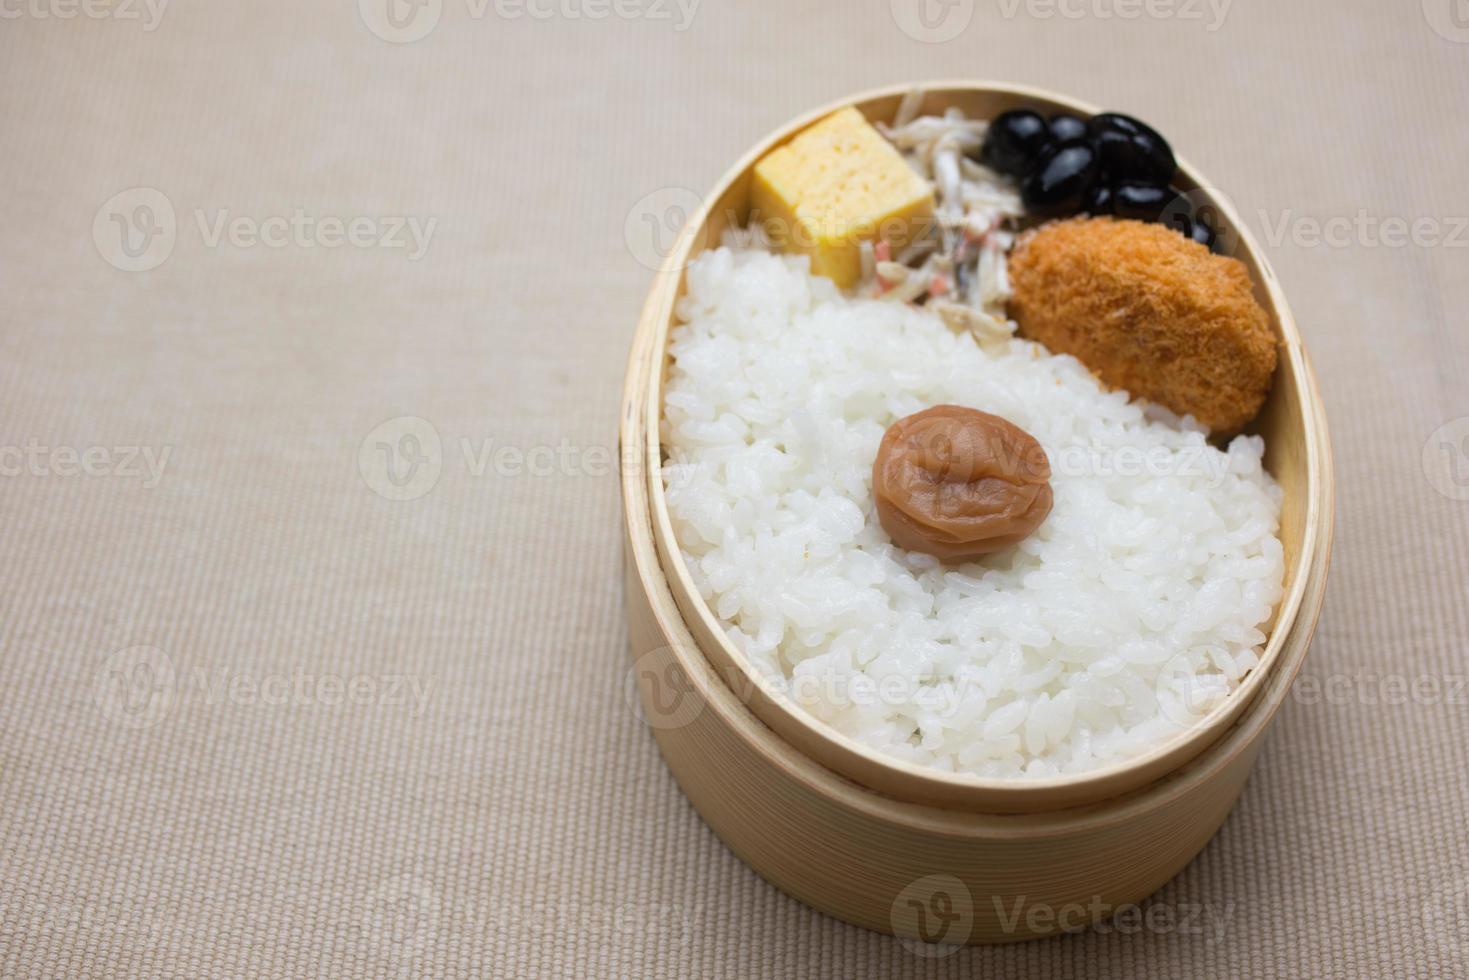 Japanse lunchbox Hinomaru Bento (日 の 丸 弁 当) foto